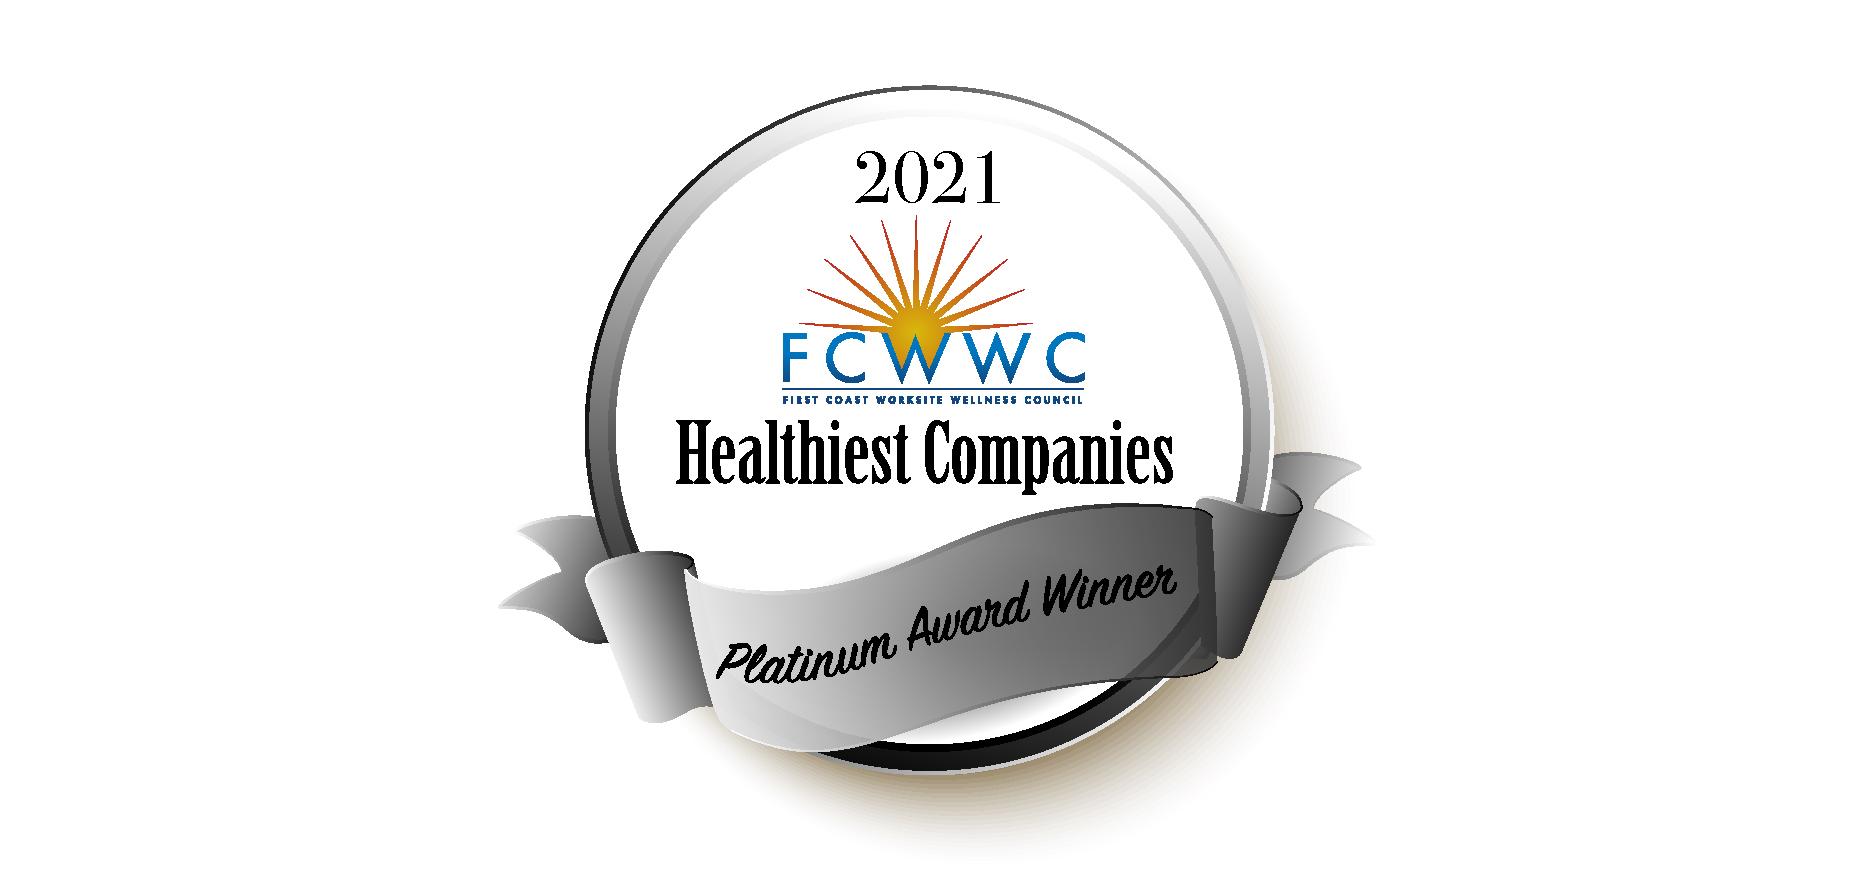 First Coast Healthiest Companies Awards Pace Fit Program Platinum Award